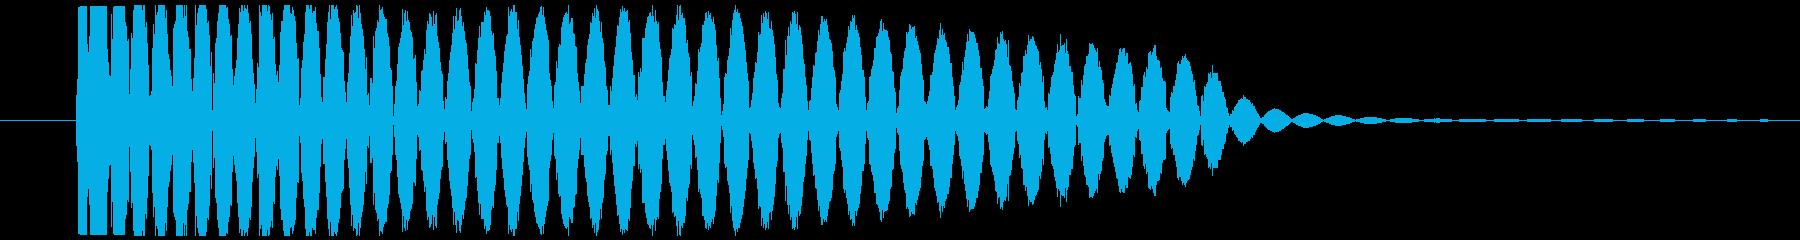 SFメカの足音の再生済みの波形